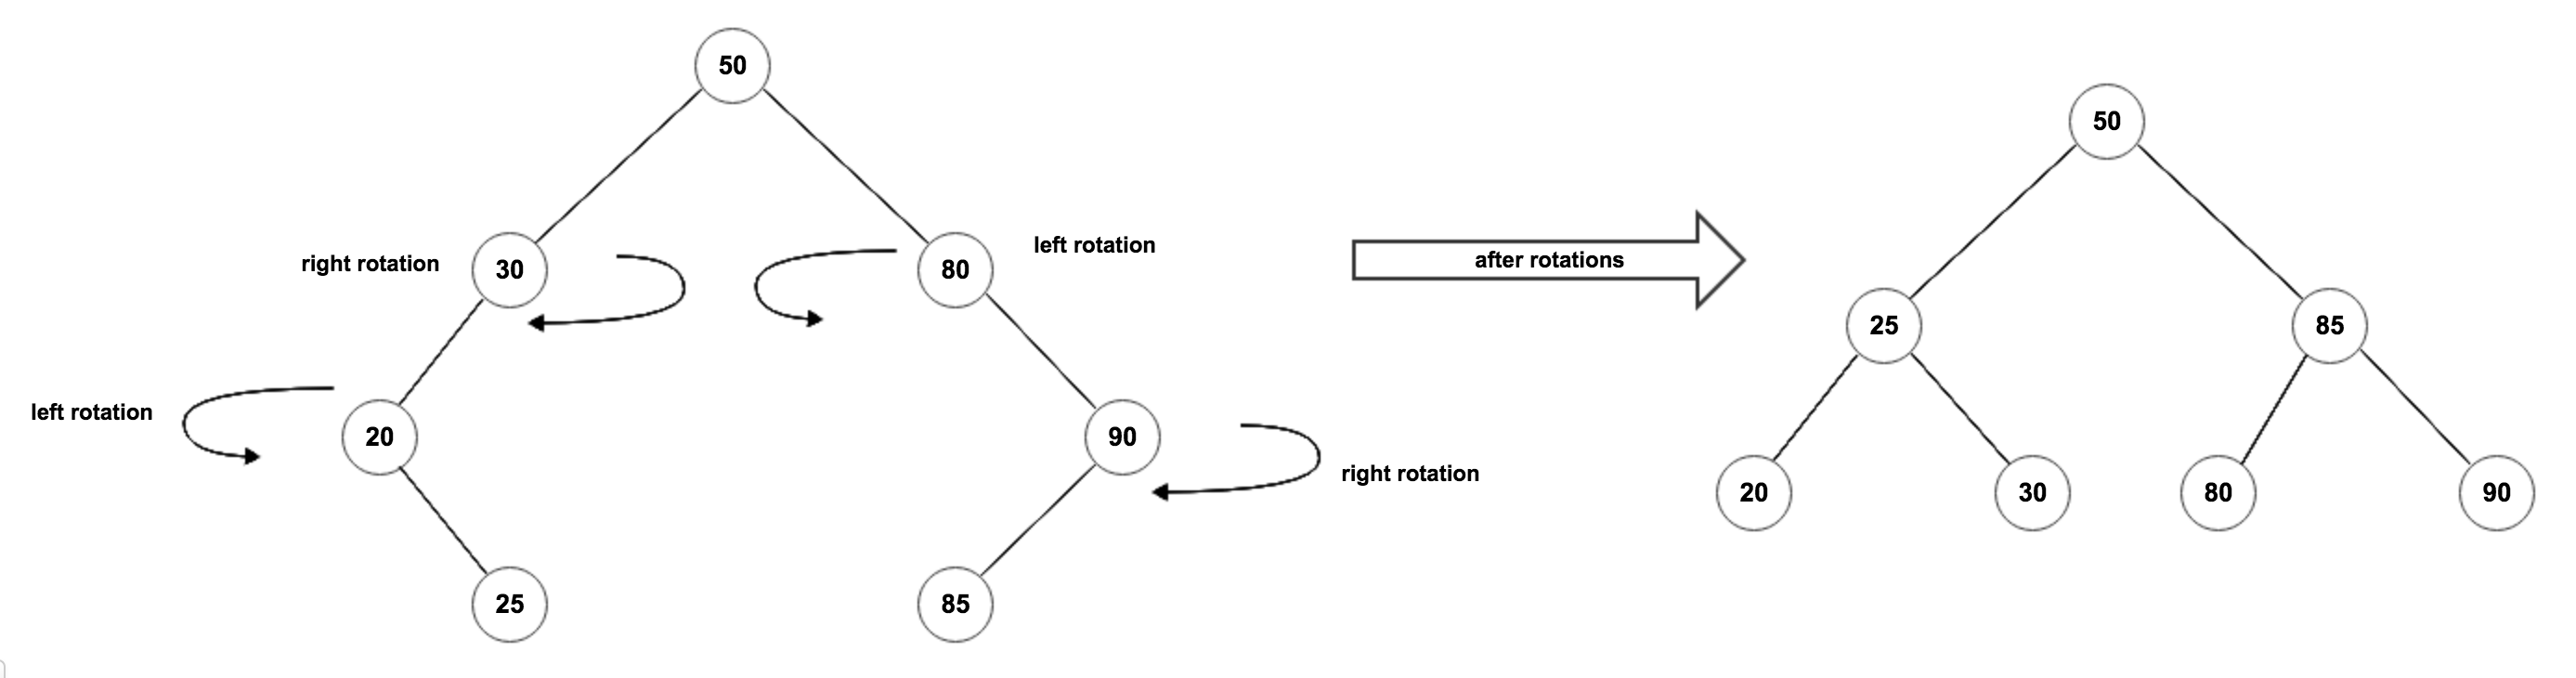 GitHub - datastructures-js/avl-tree: avl tree (a self balancing